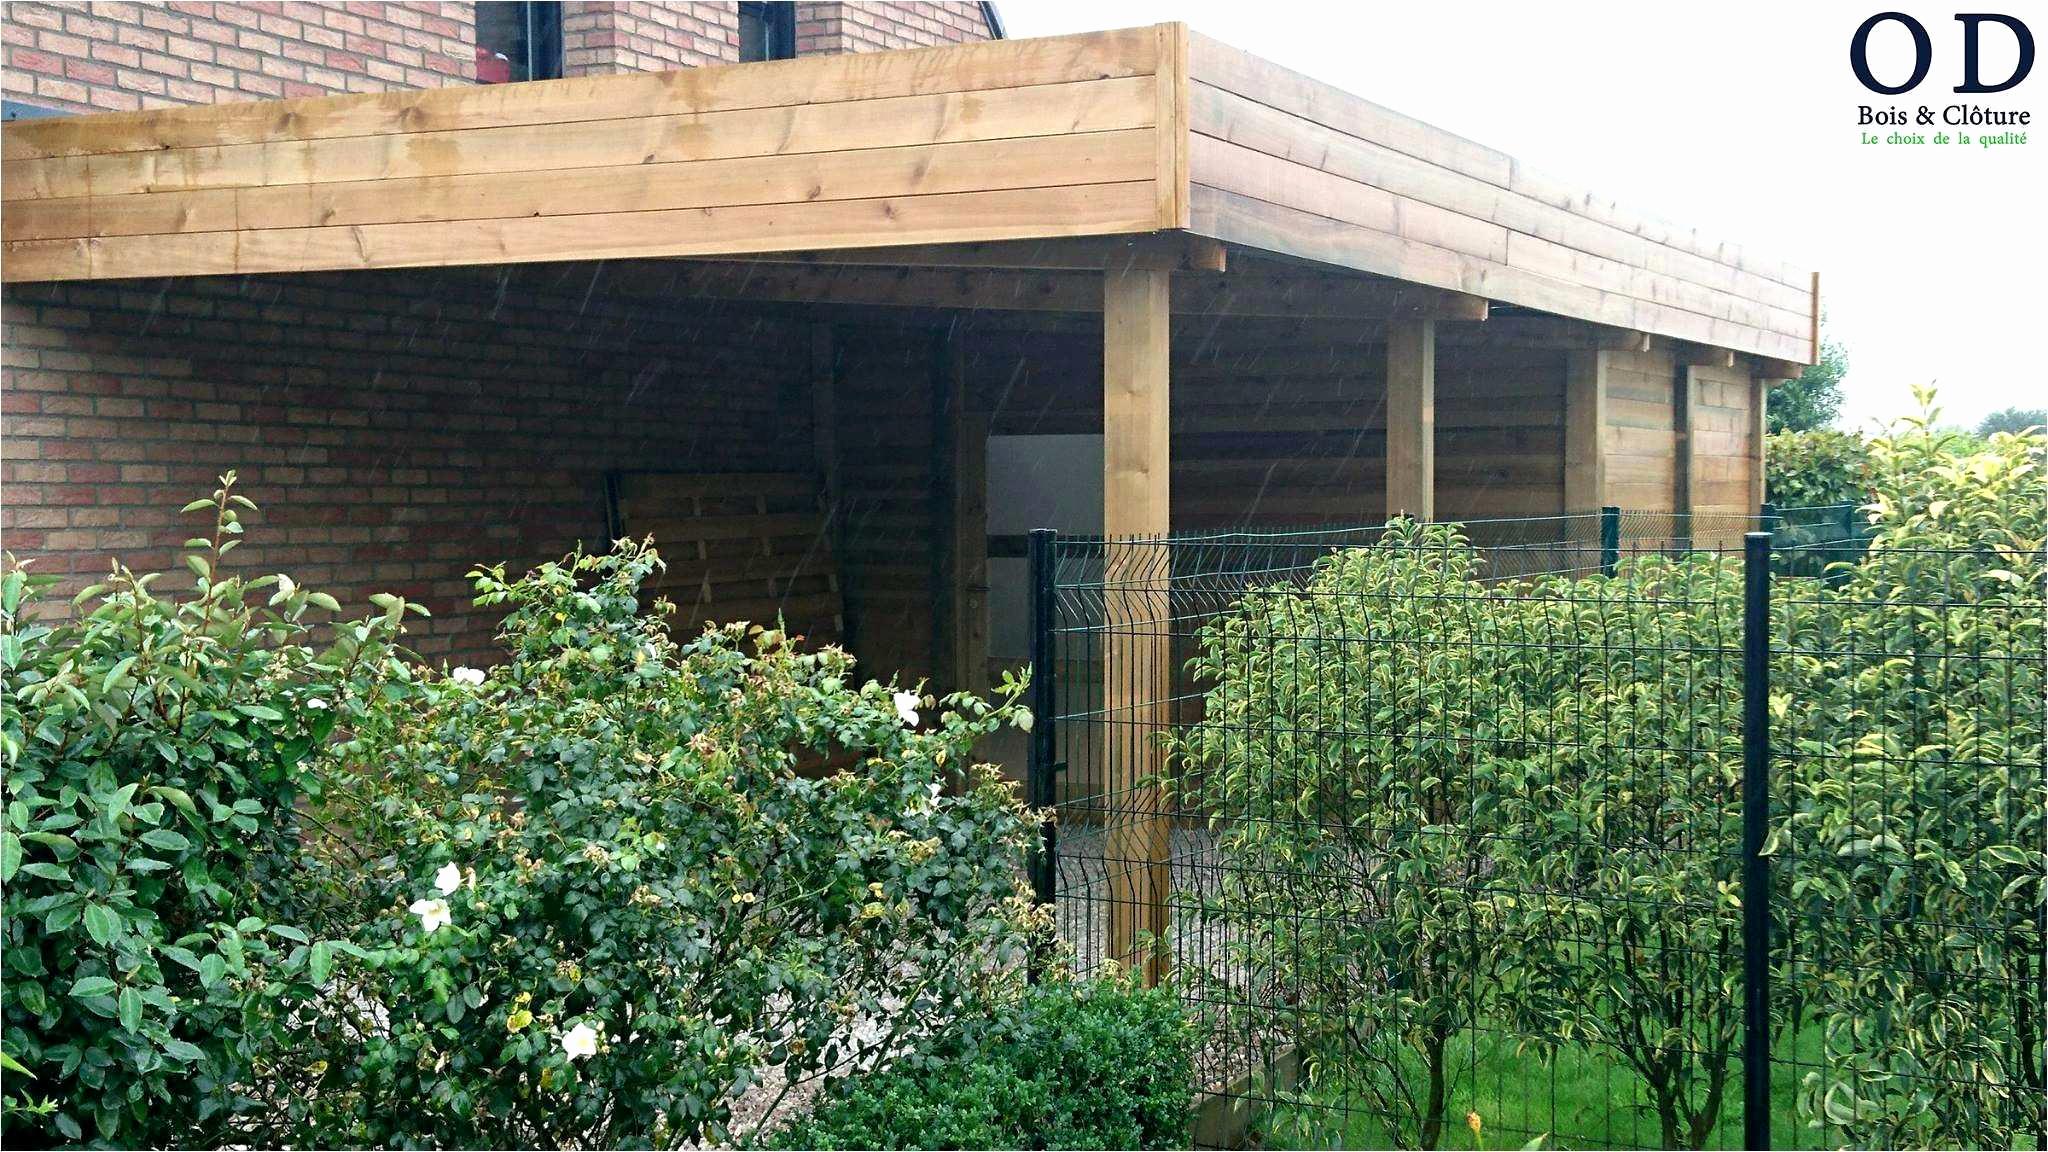 fabriquer un salon de jardin en bois elegant construire abri jardin impressionnant 29 idee installer un abri de of fabriquer un salon de jardin en bois